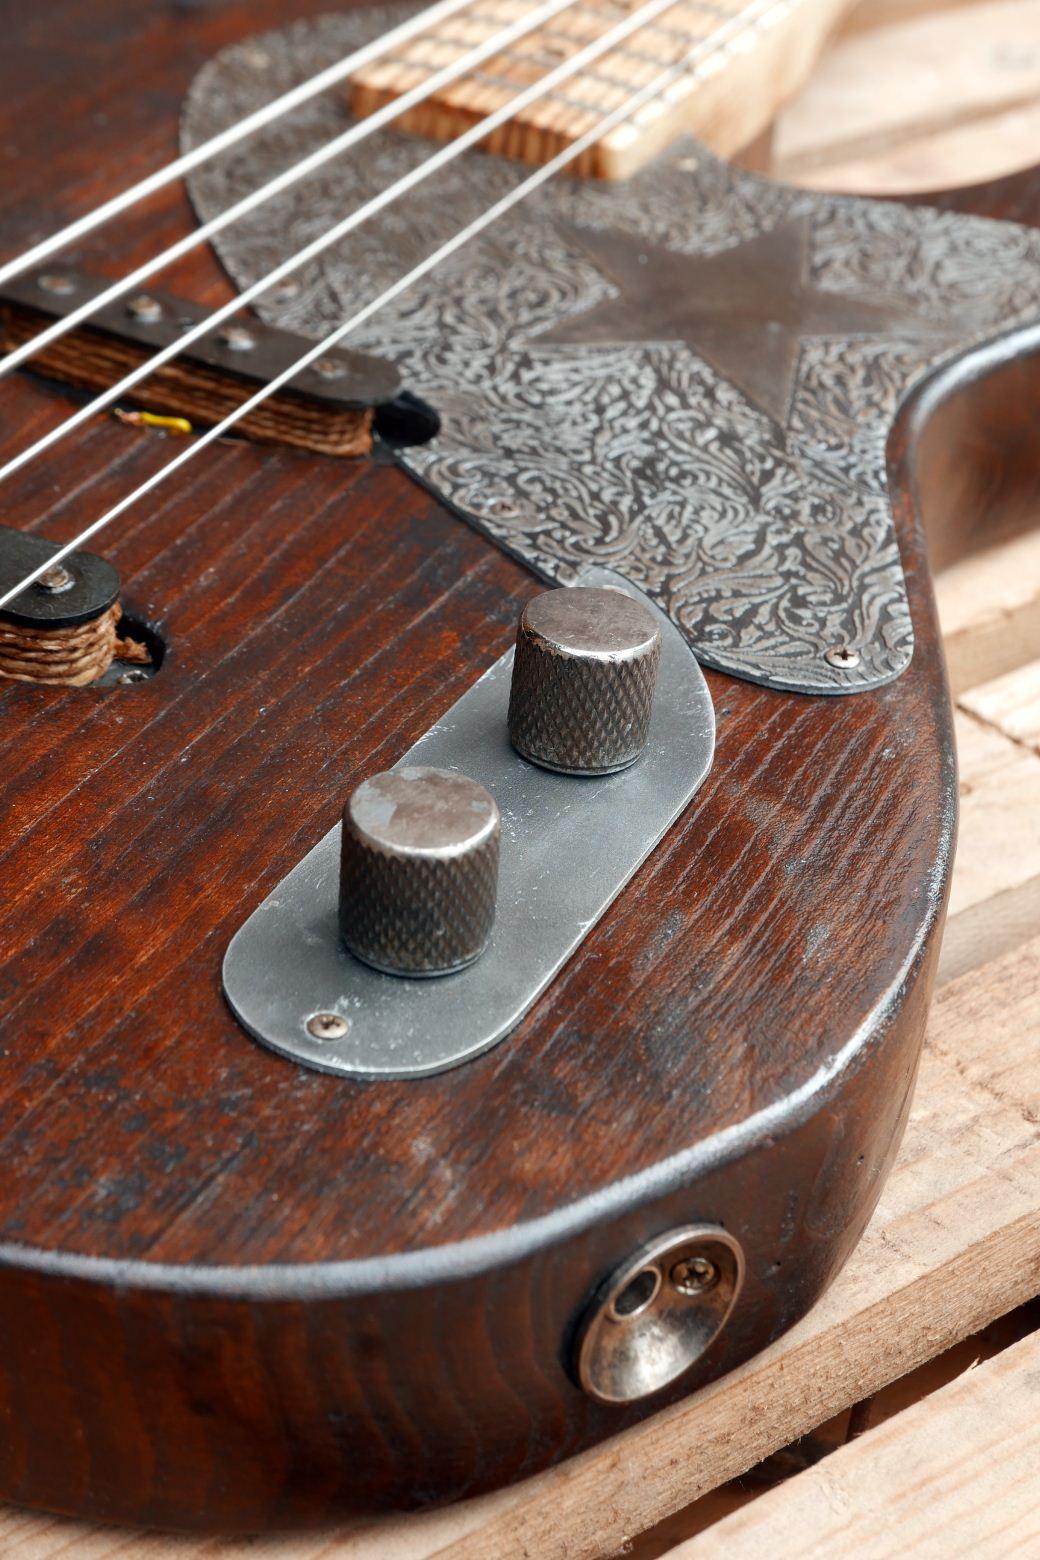 tele bass controls